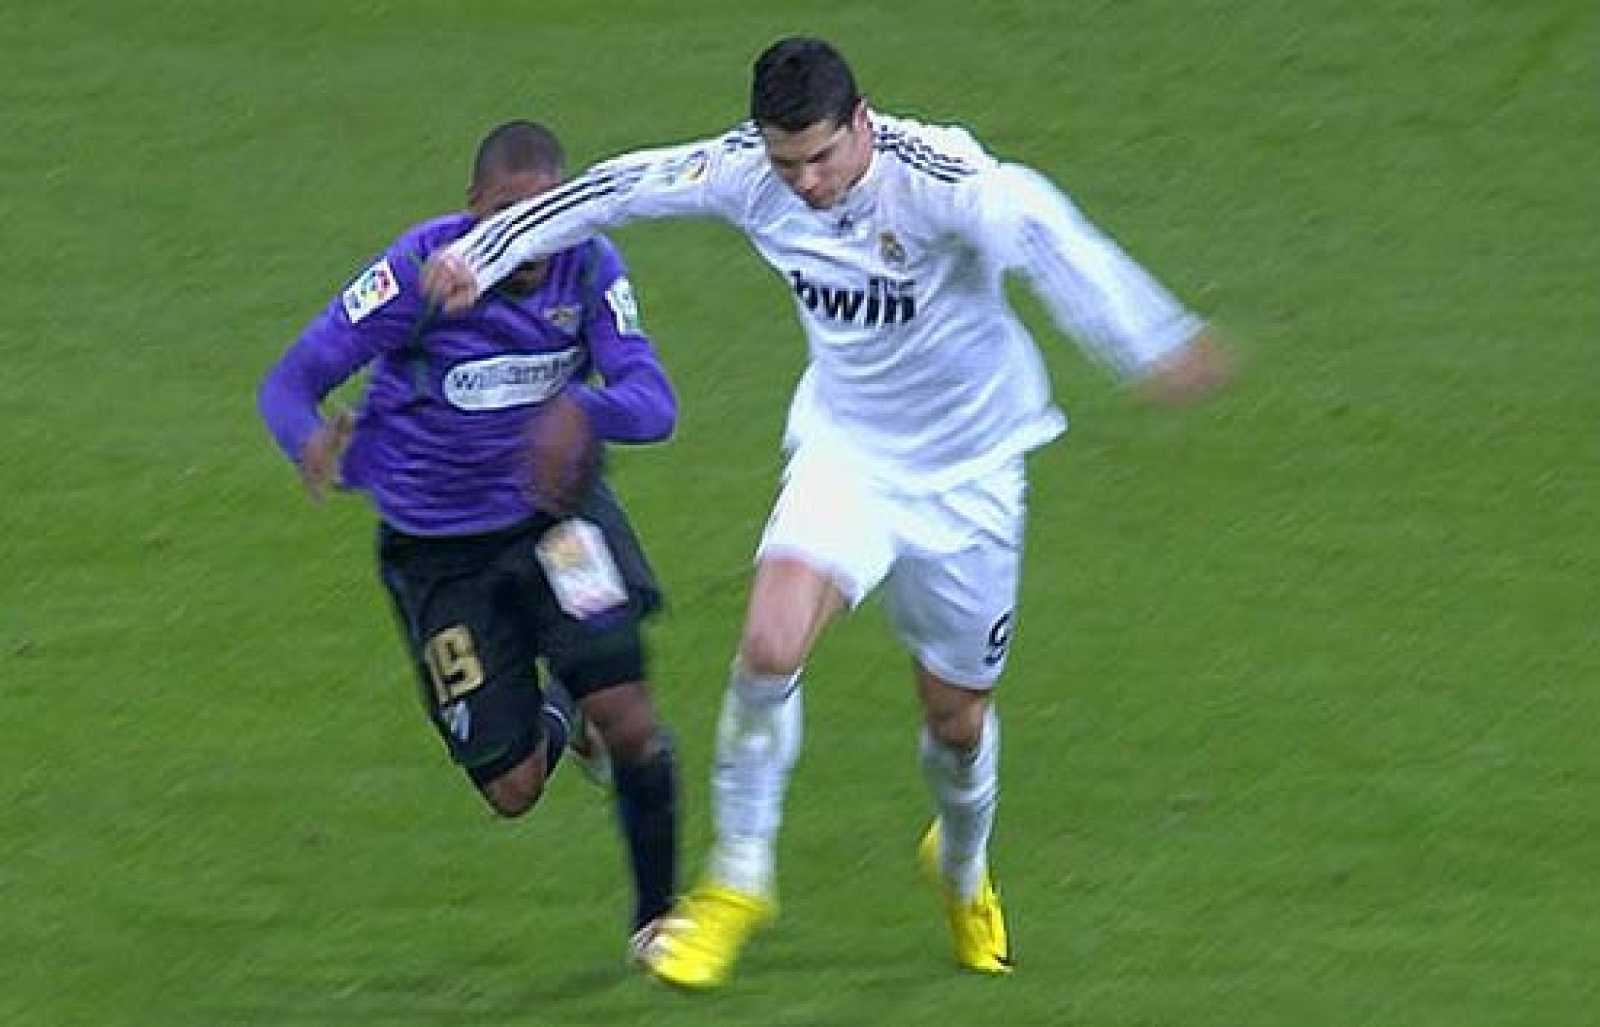 9da67cffd5 El Real Madrid gana al Málaga gracias a un Ronaldo  bipolar  - RTVE.es